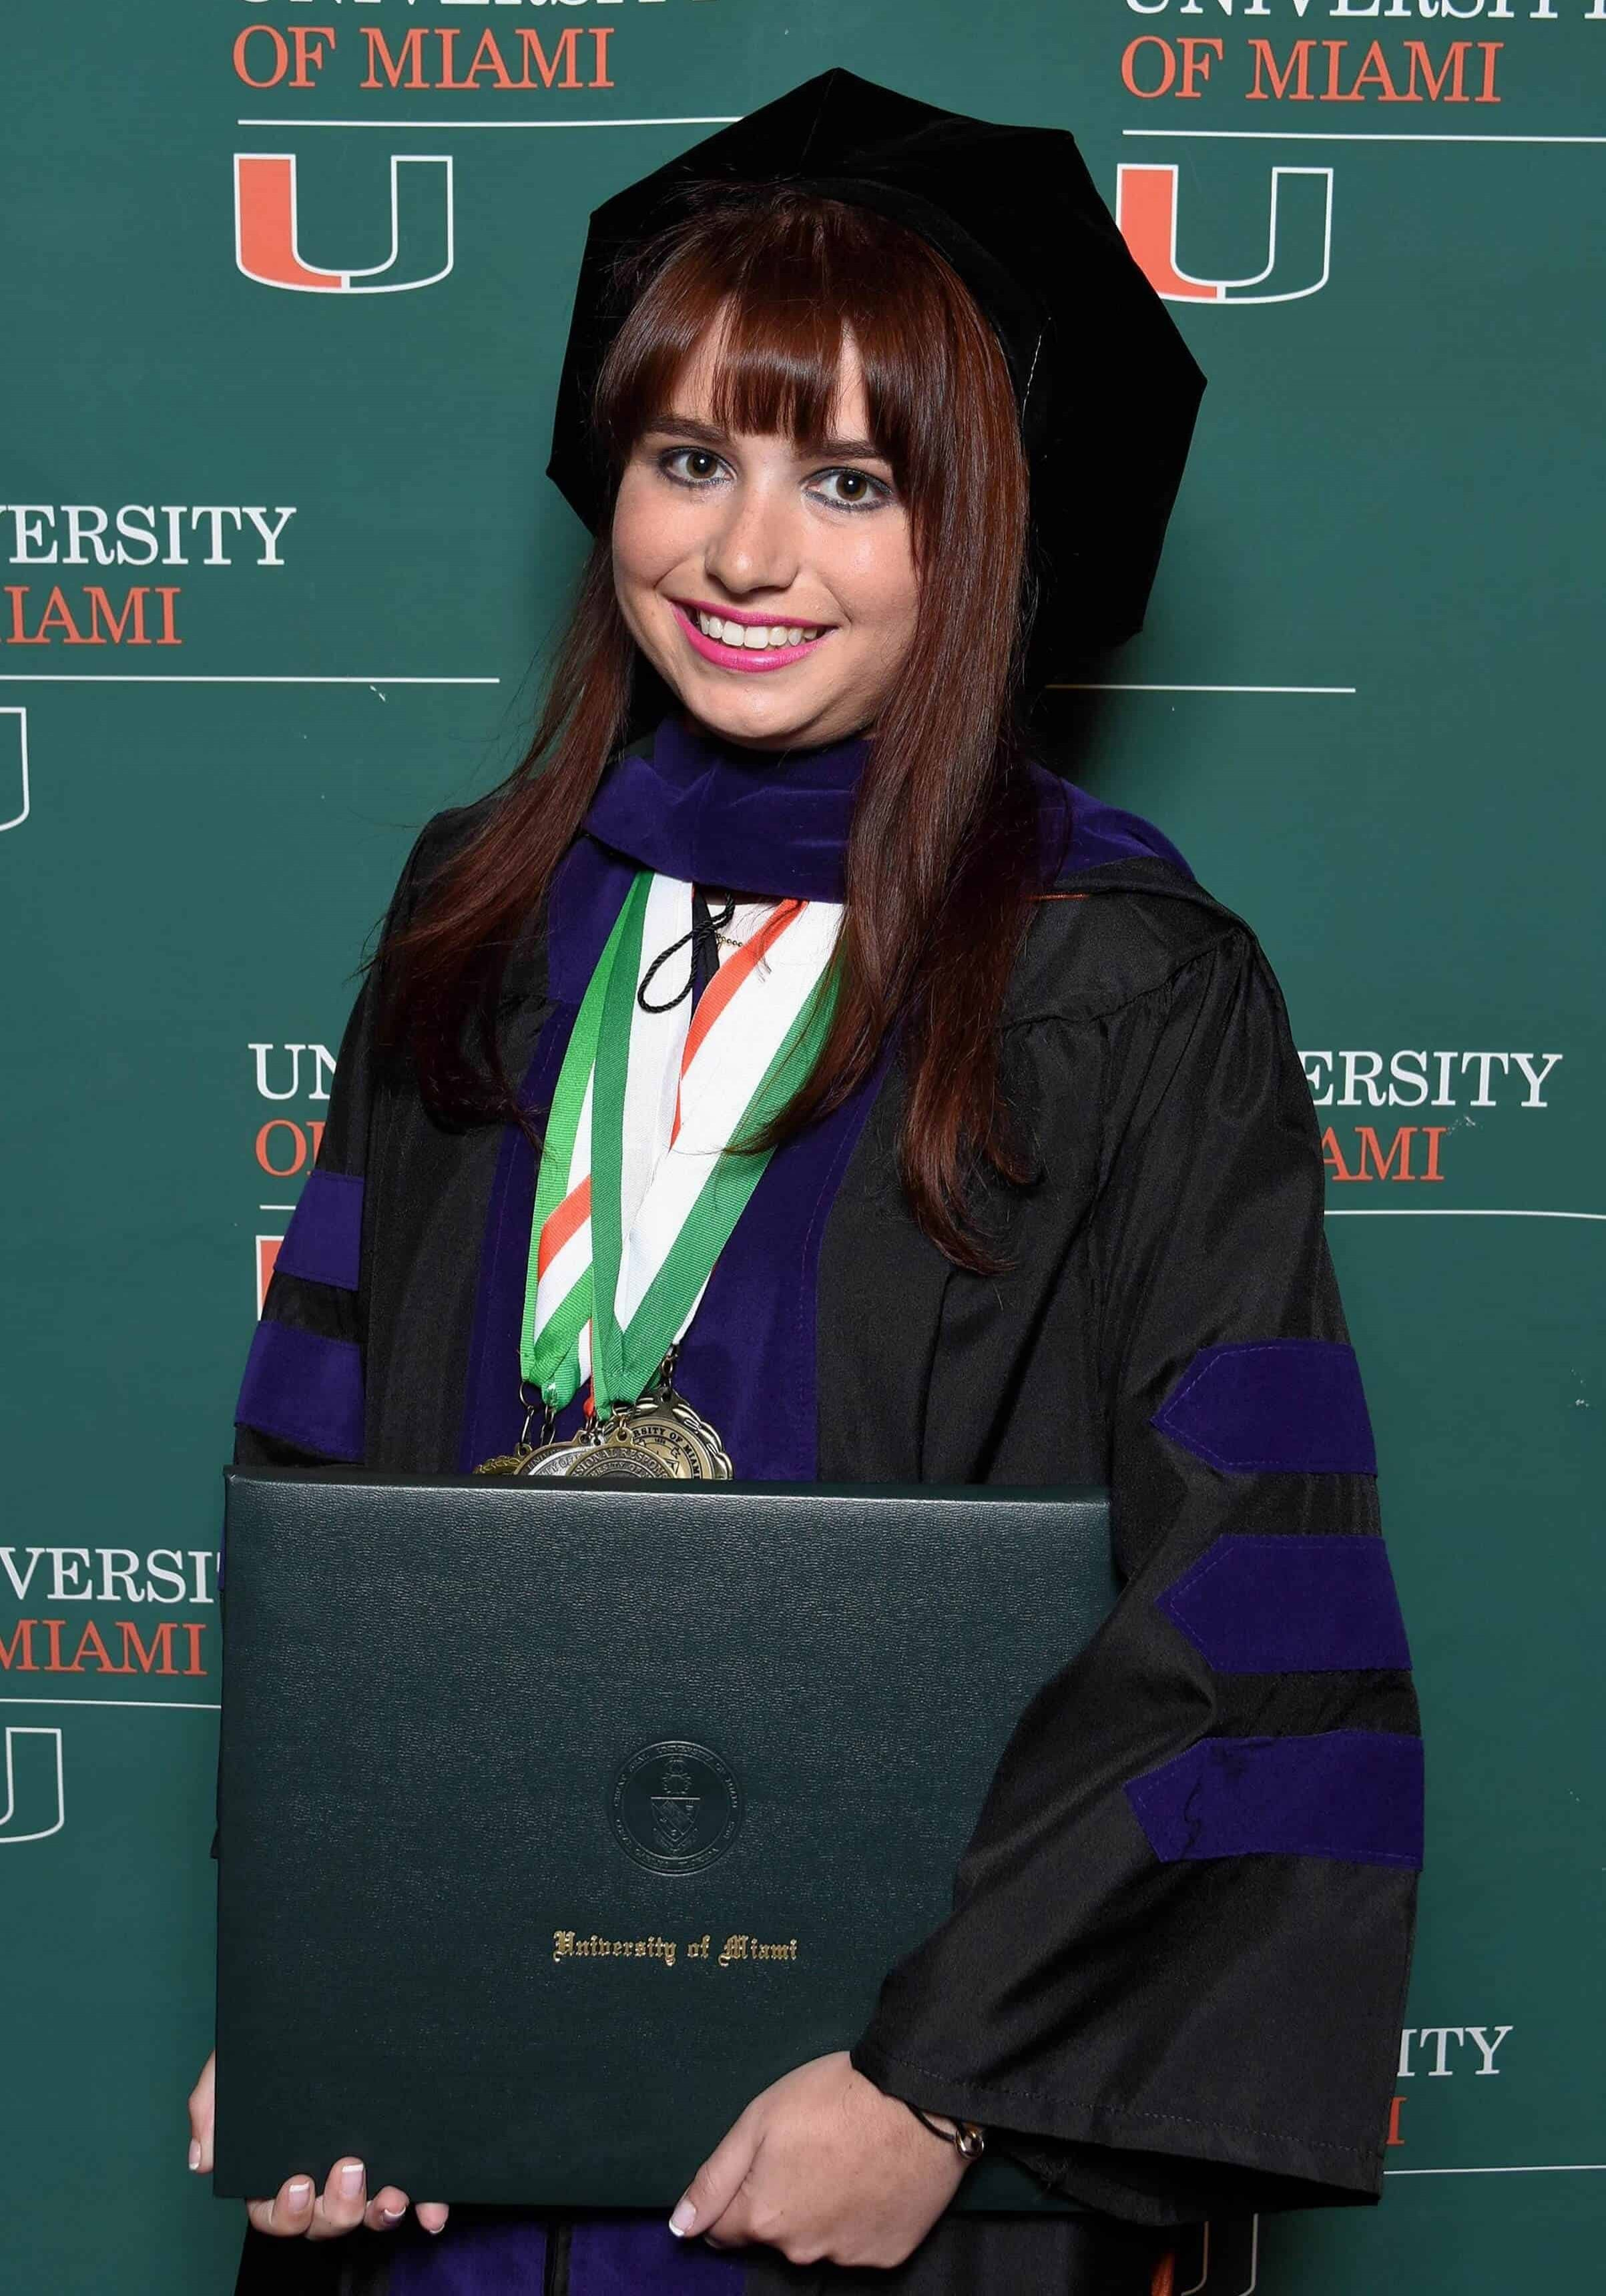 Haley Moss Graduate